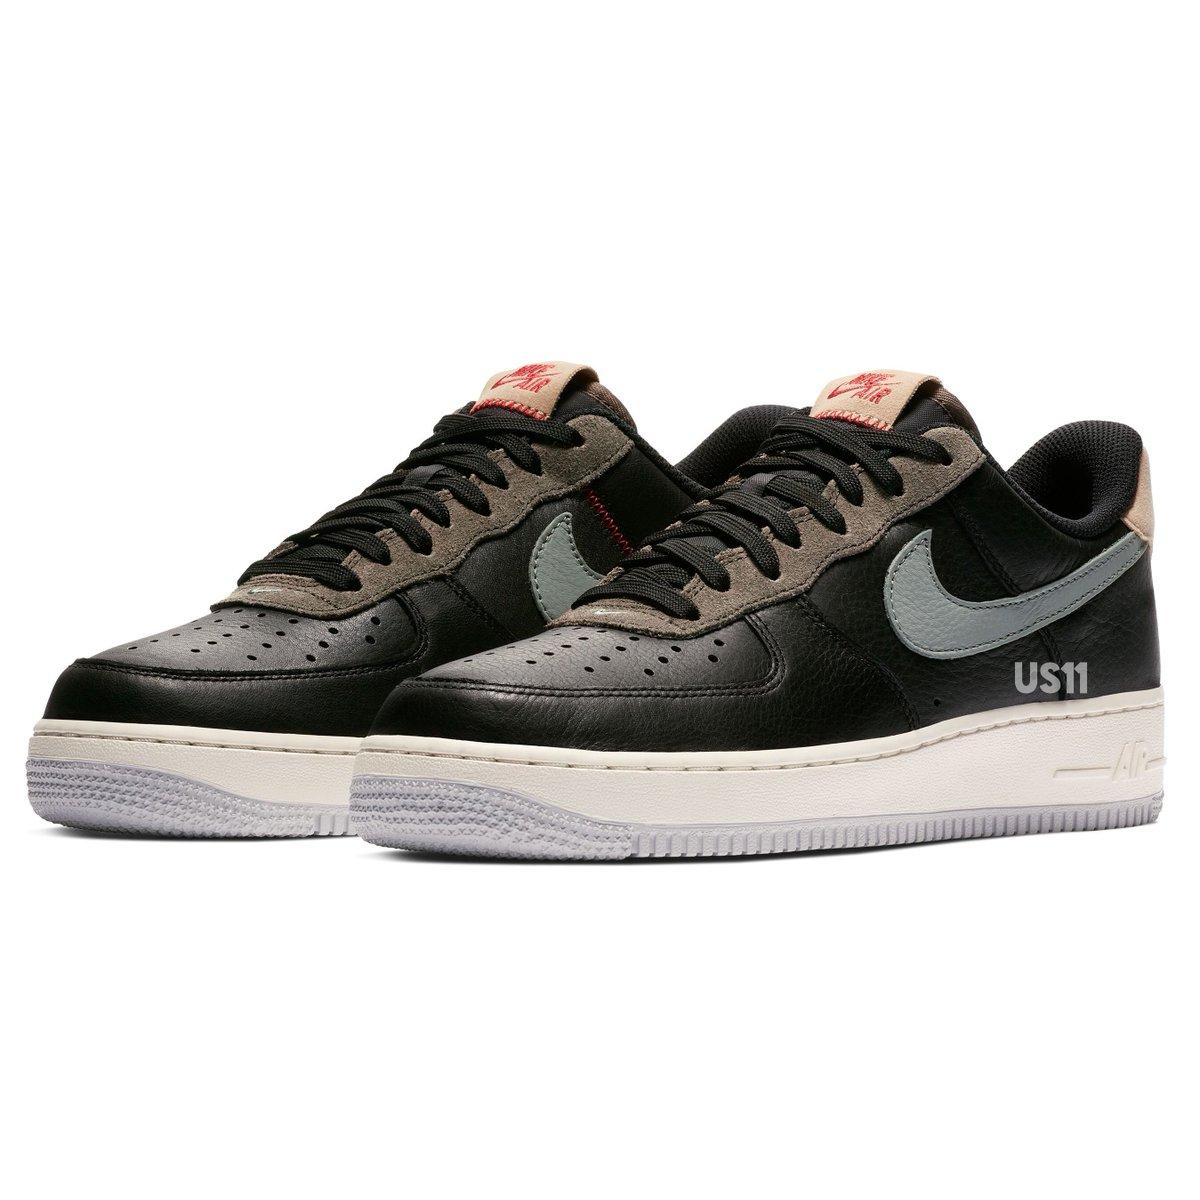 sports shoes 31e5b cba87 AIR FORCE 1  07 BLACK MICA GREEN-RIDGEROCKpic.twitter.com UnAY3Ecs3I